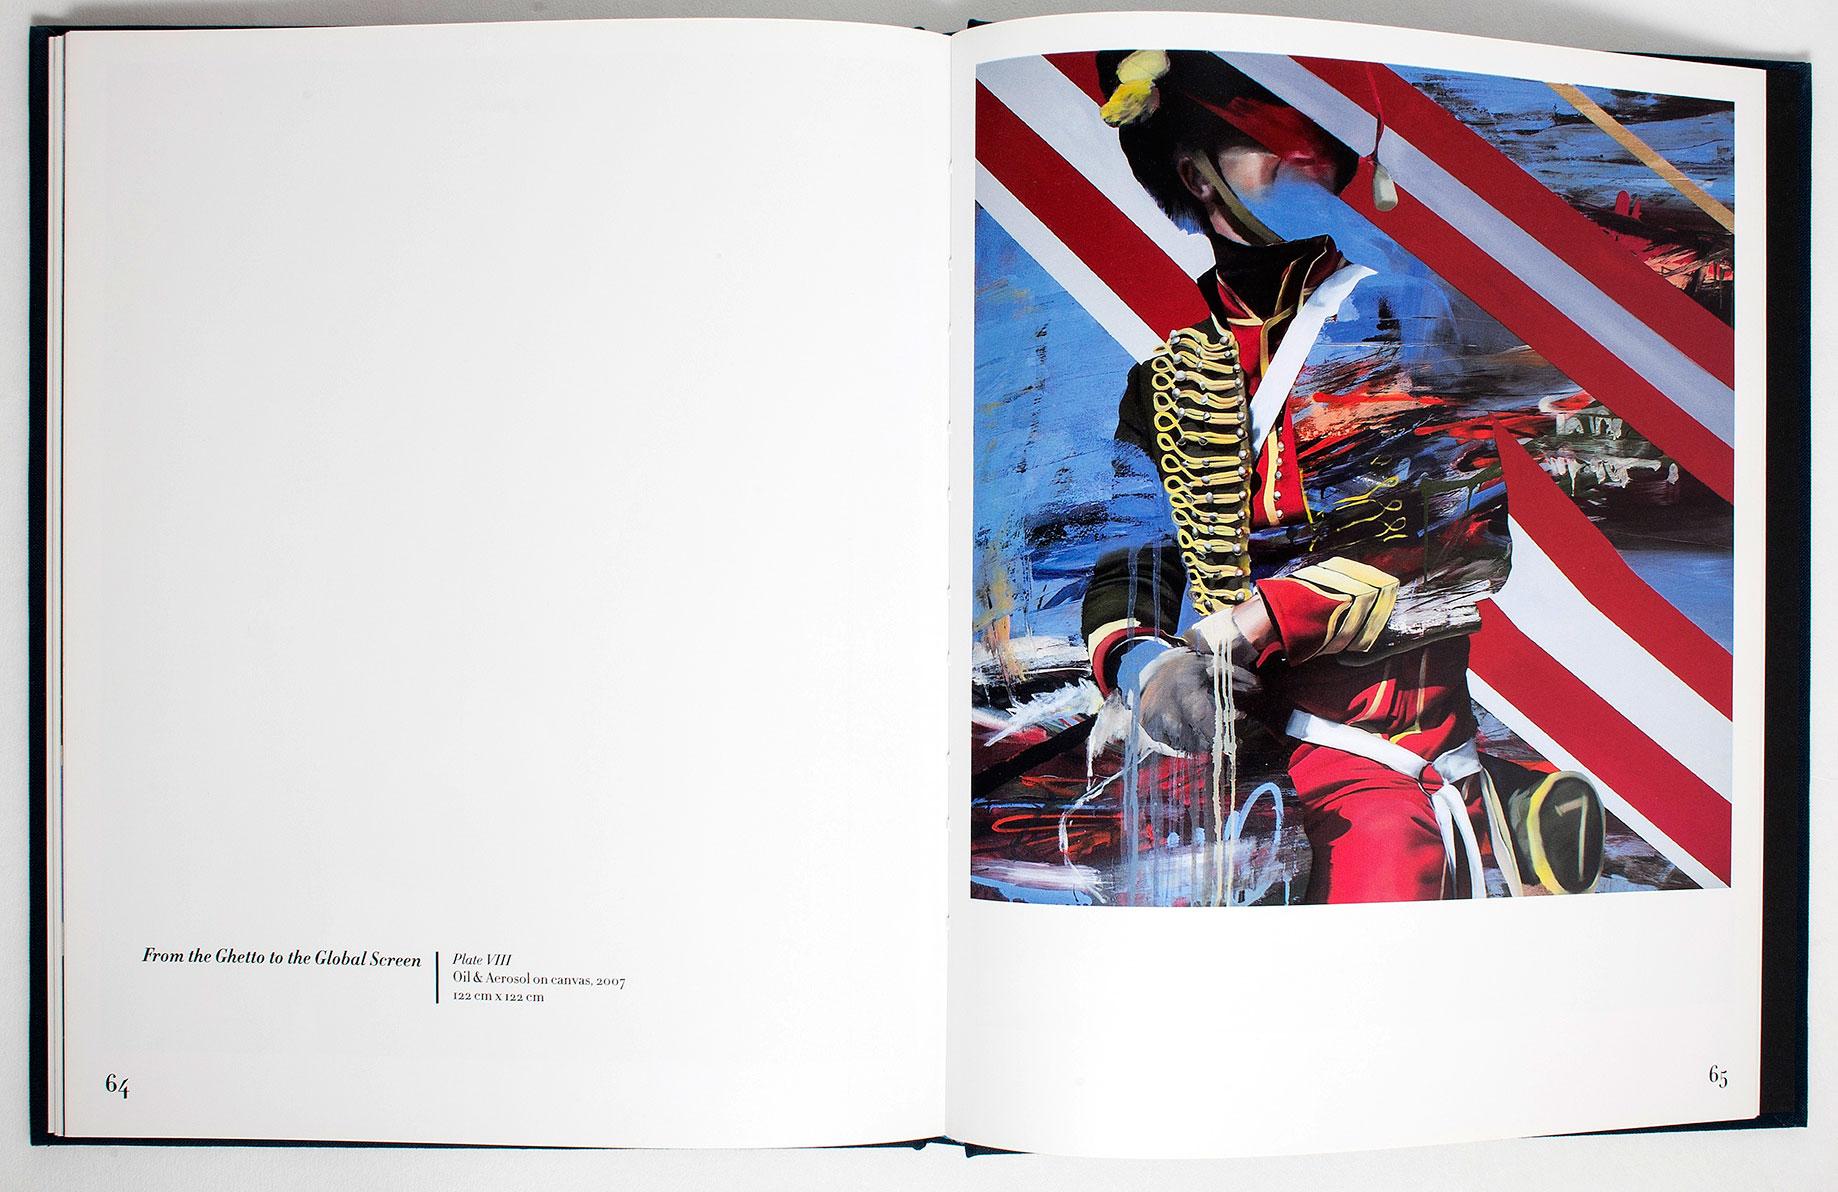 epm-print-management-bristol-art-books-4.jpg